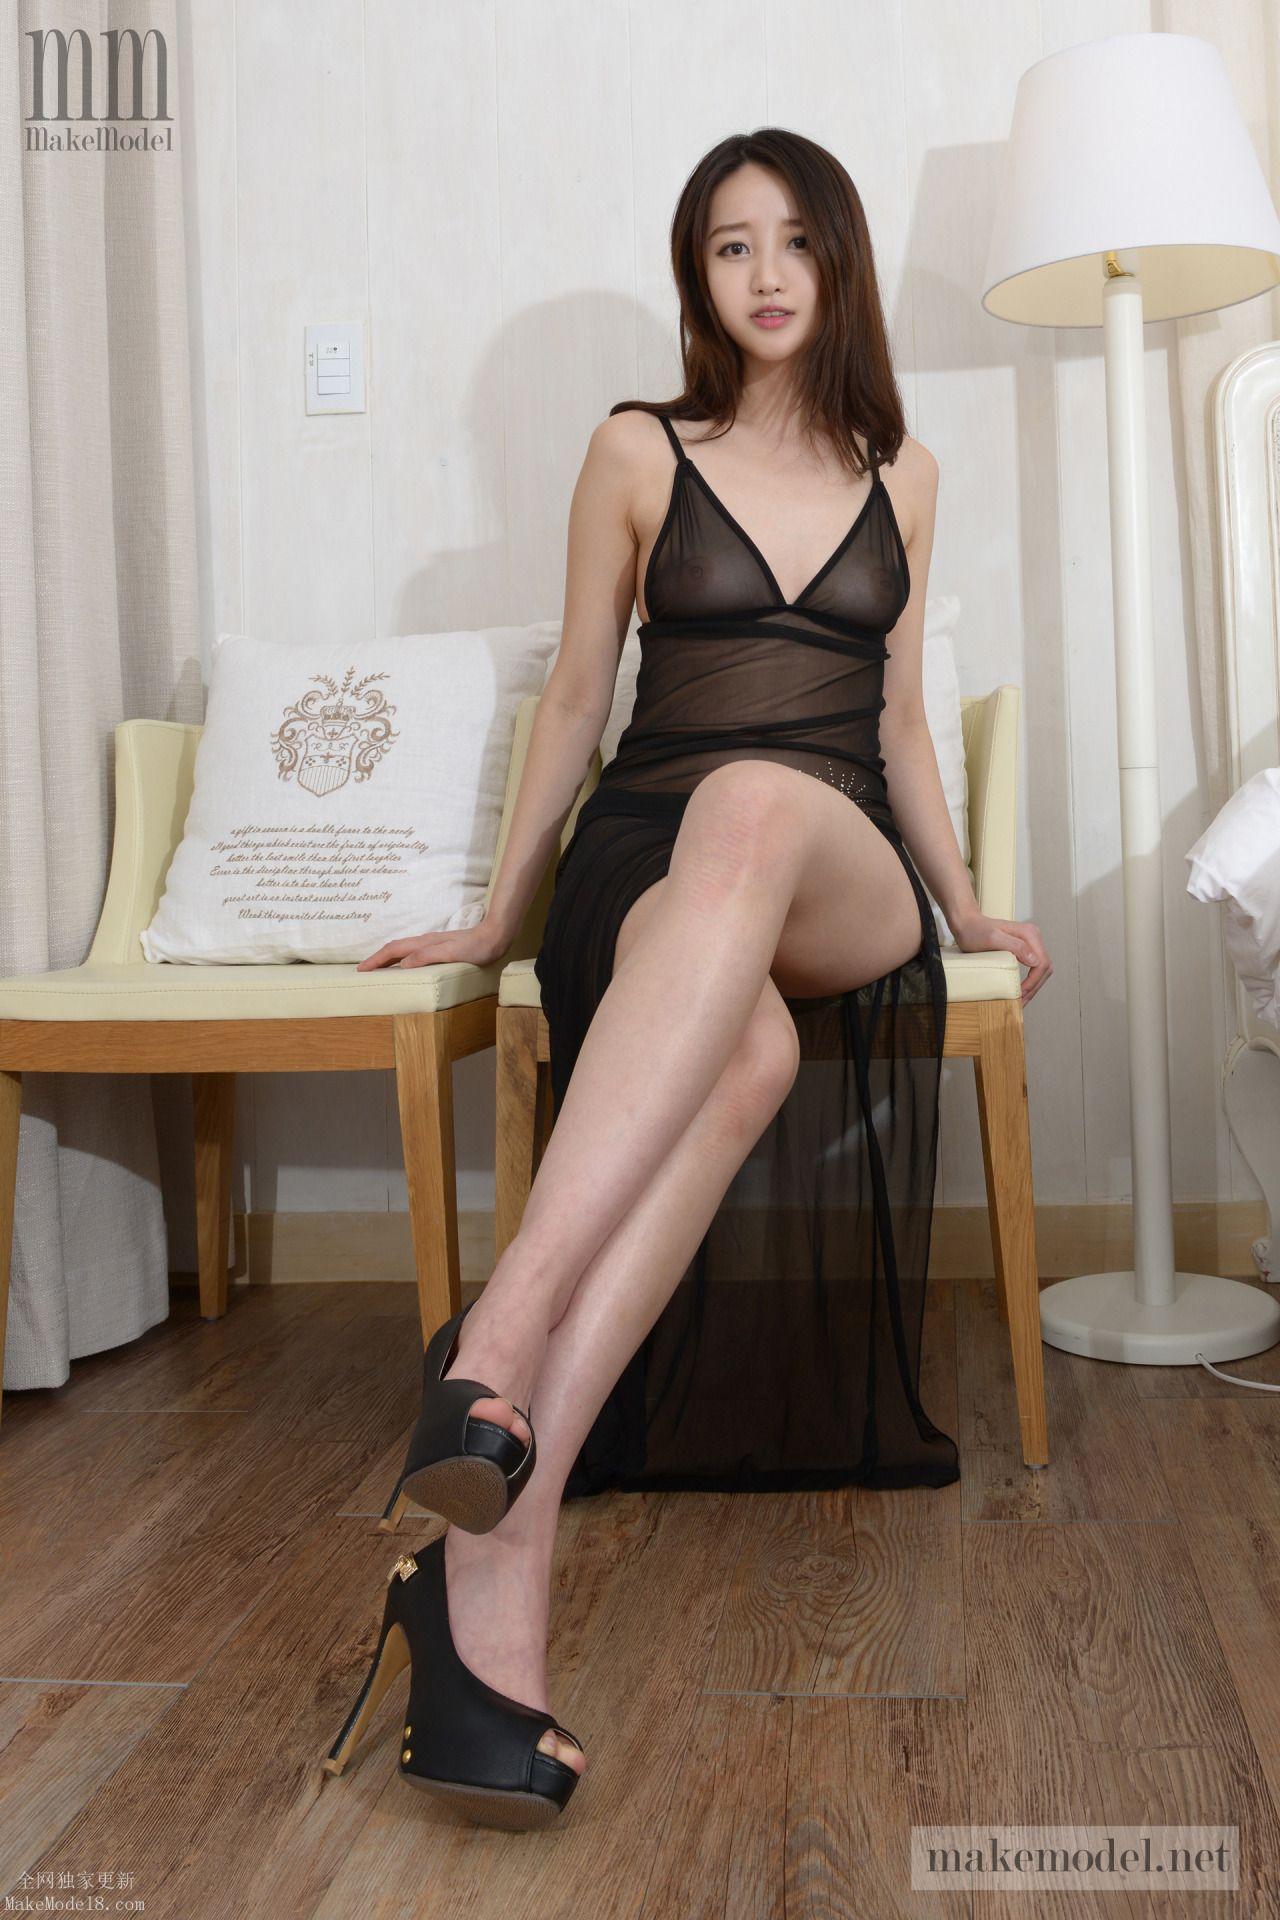 makemodel sua 수아 Pin by Barunori Alfa on SUA 수아 with Black Robe, MAKEMODEL | Pinterest